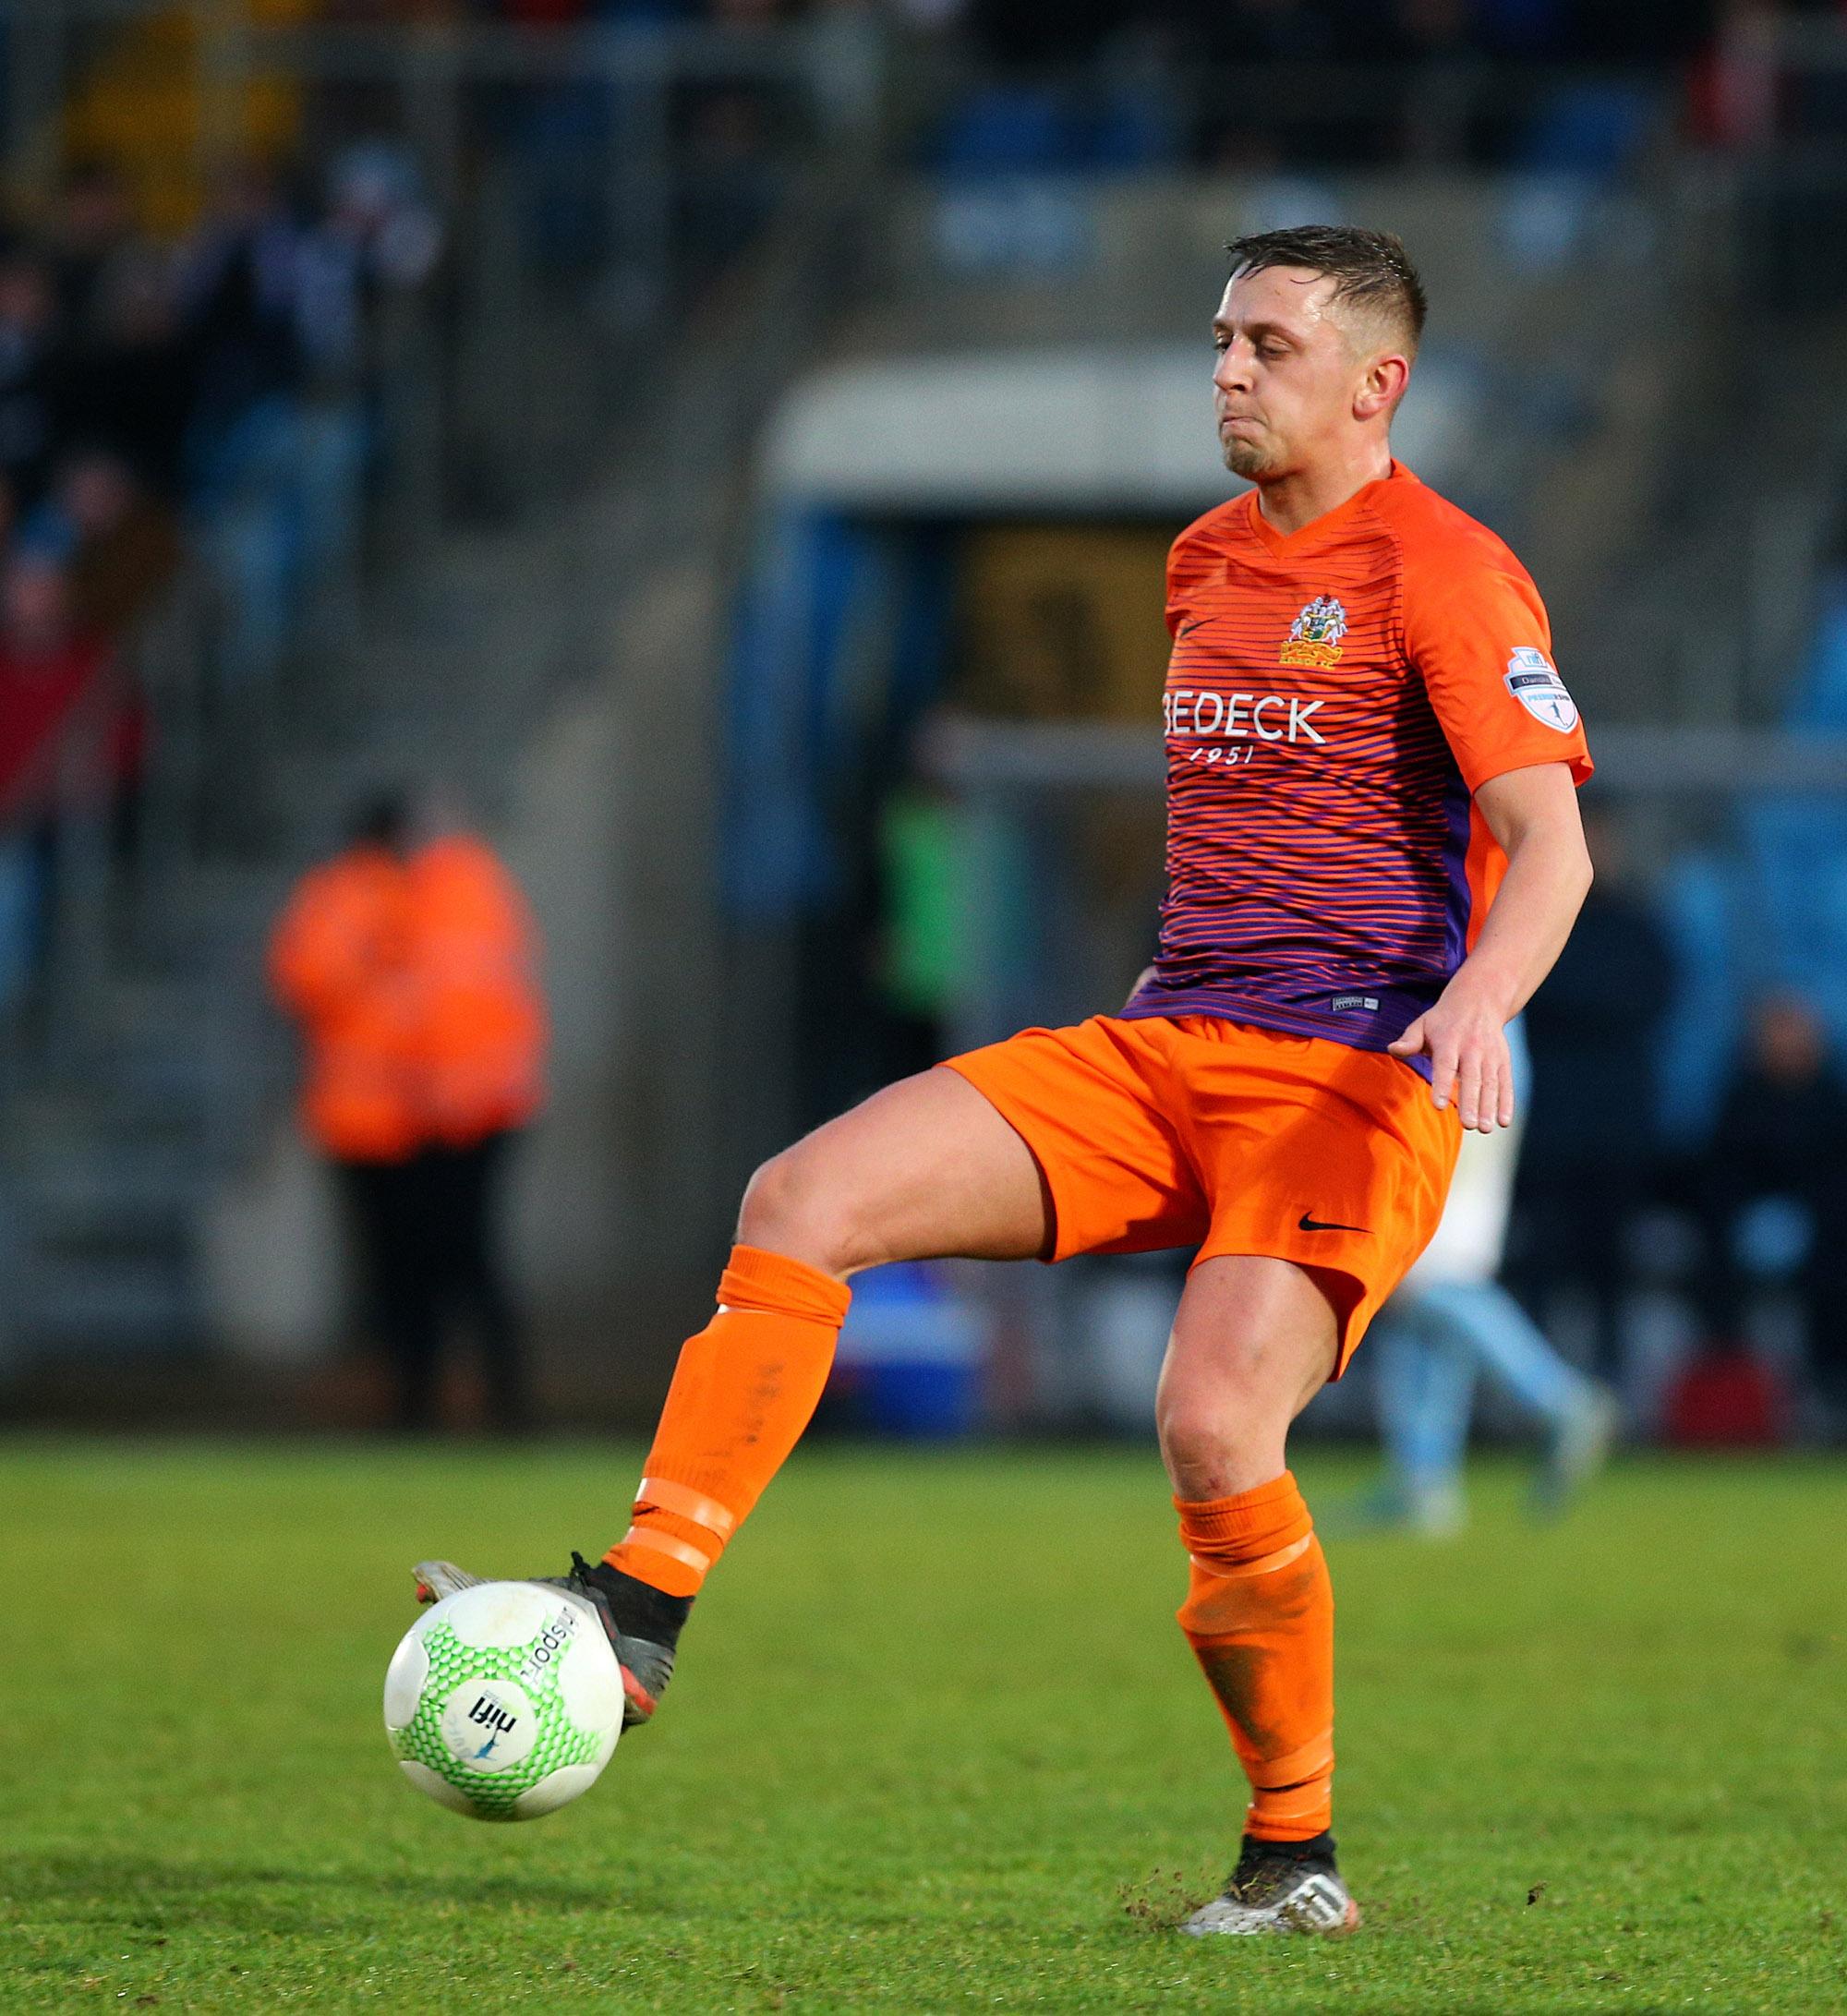 Matthew Snoddy returns to Glenavon on loan – Glenavon Football Club